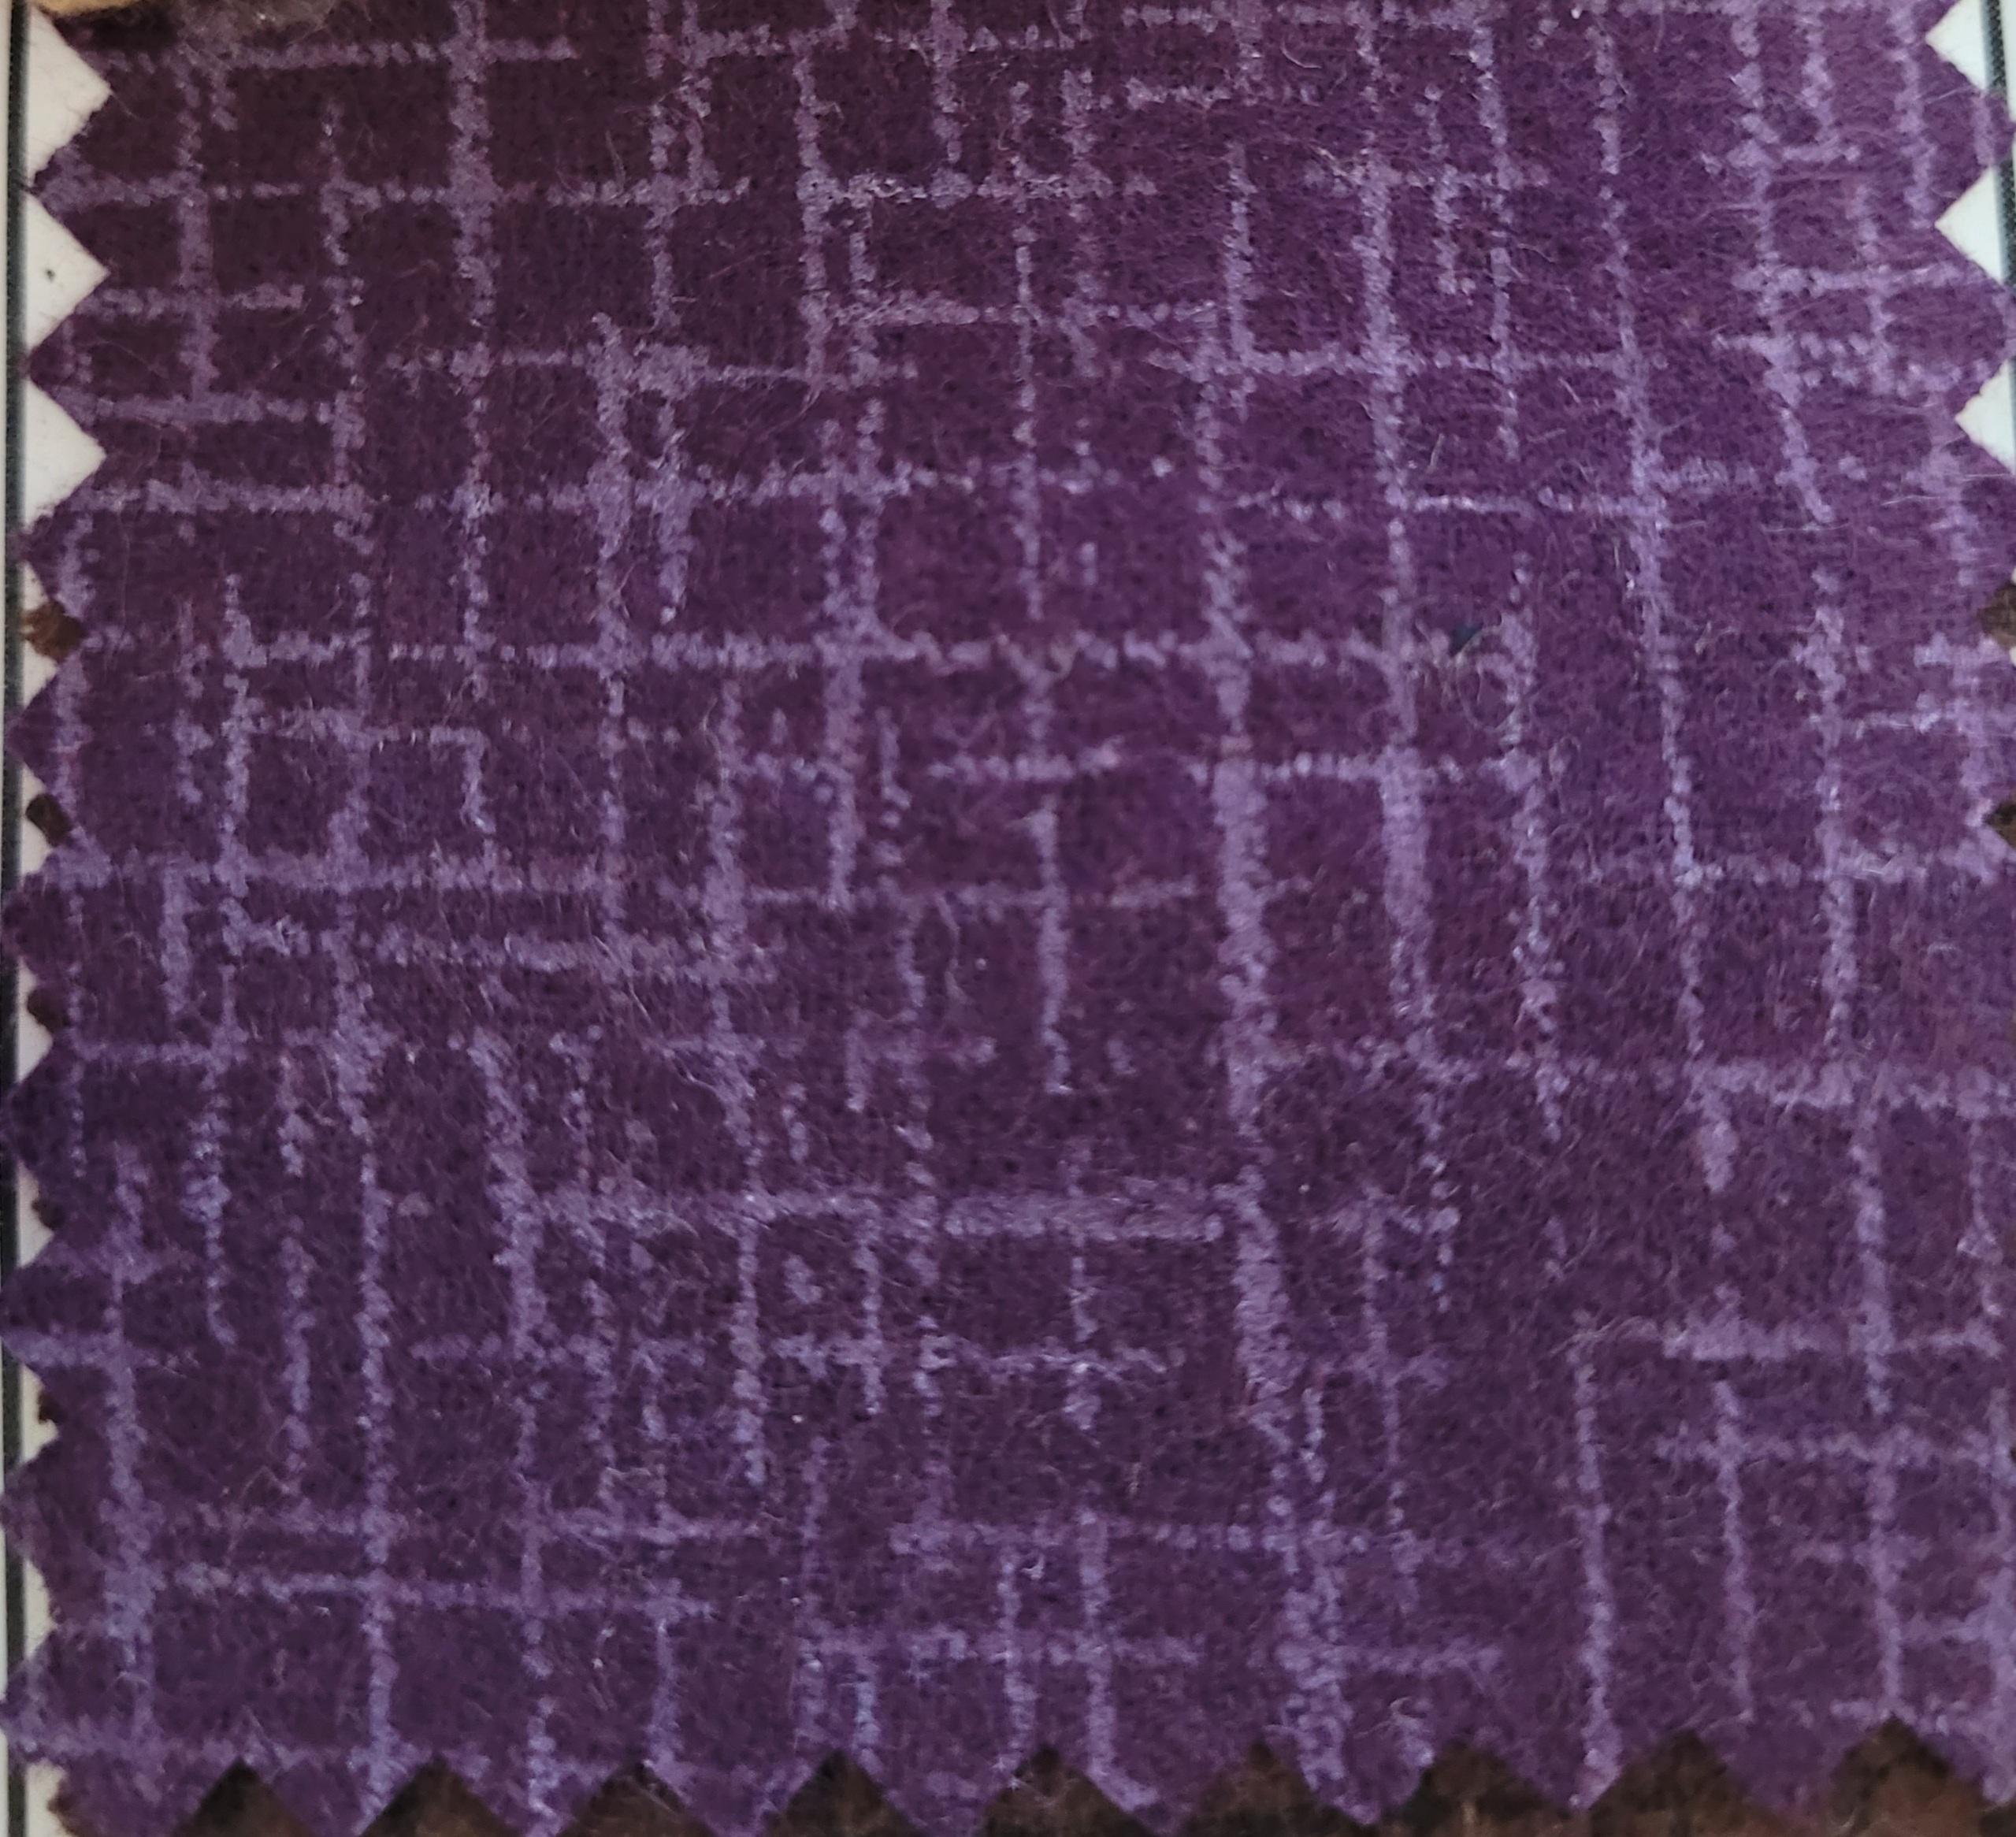 Betula Cotton flannel 109x98 - eggplant